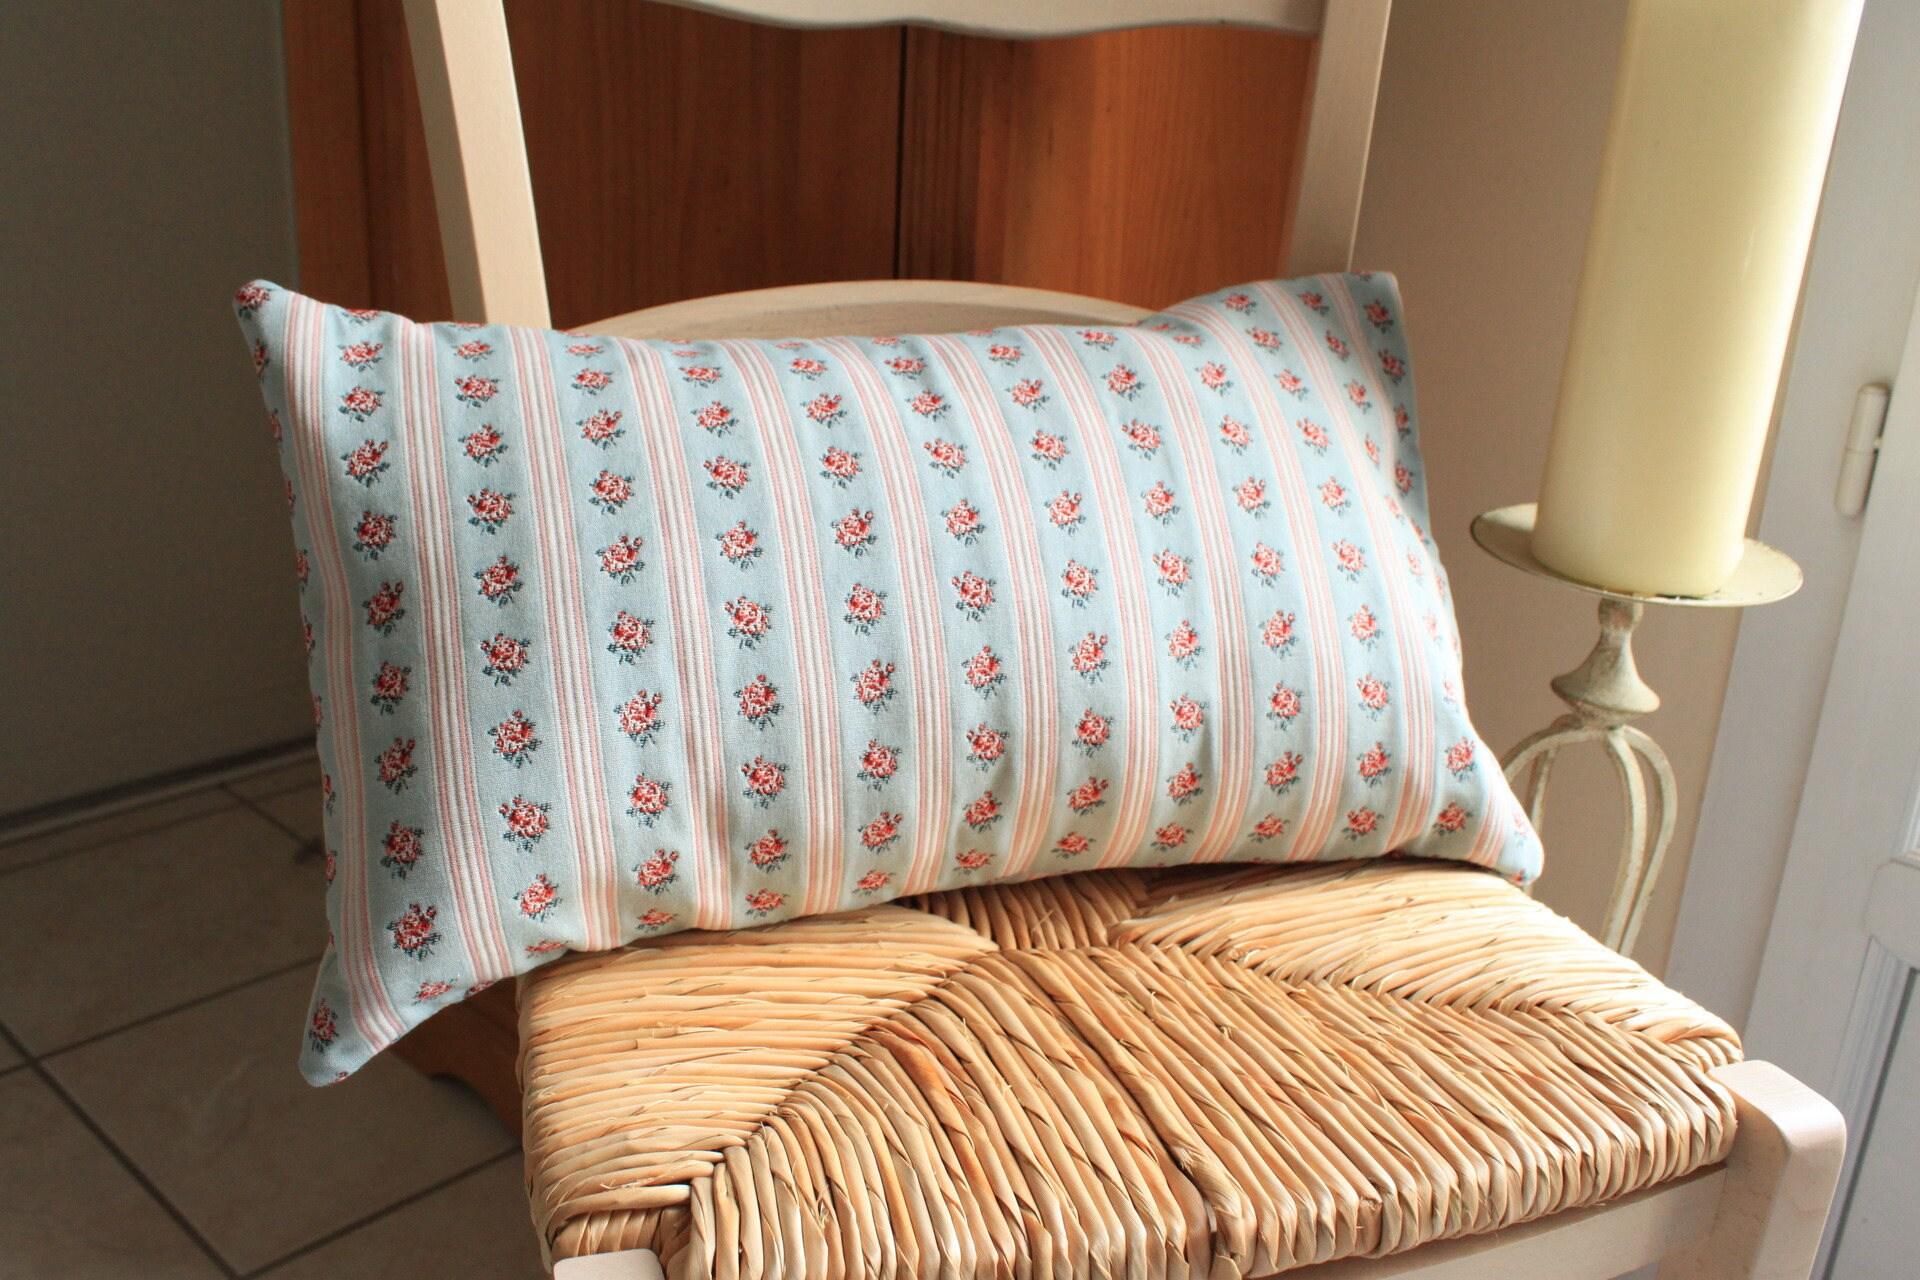 housse de coussin forme traversin motif floral ancien. Black Bedroom Furniture Sets. Home Design Ideas